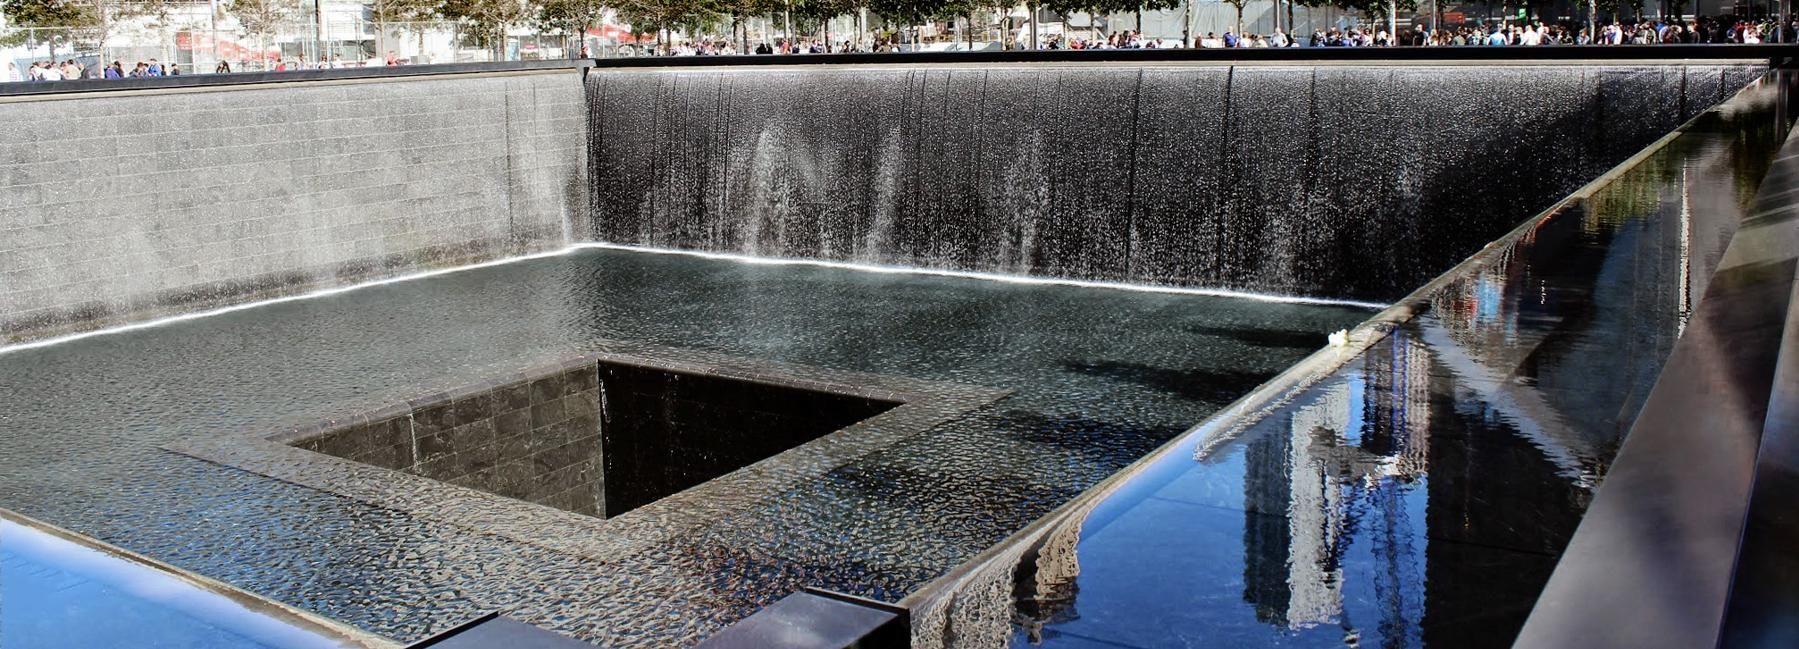 New York City: Private 9/11 Memorial and Ground Zero Tour